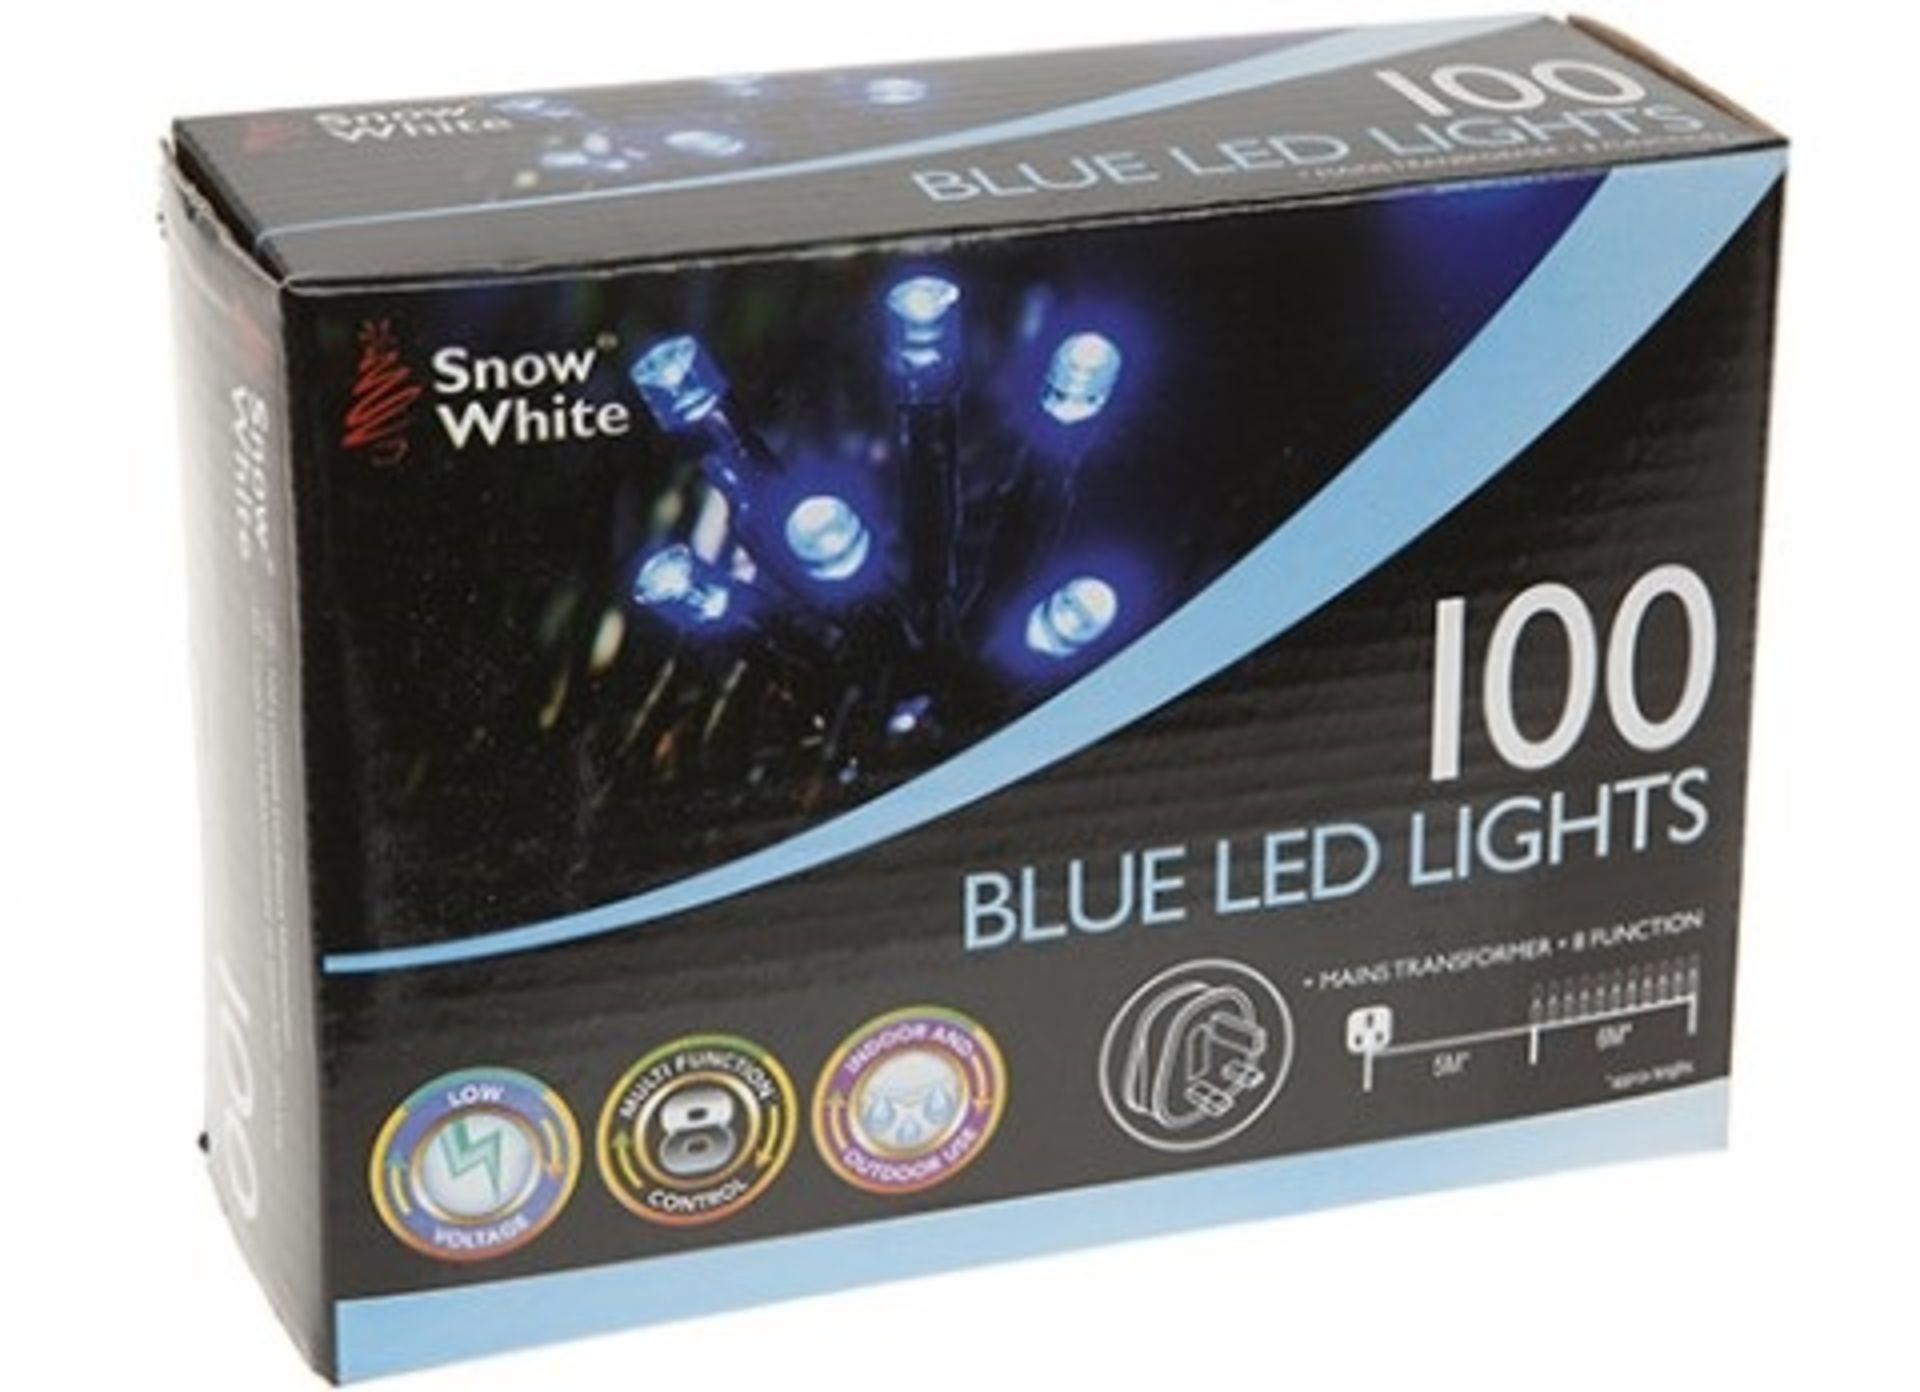 Lot 52620 - V Brand New 100 Blue LED Lights - Mains Transformer - Eight Function